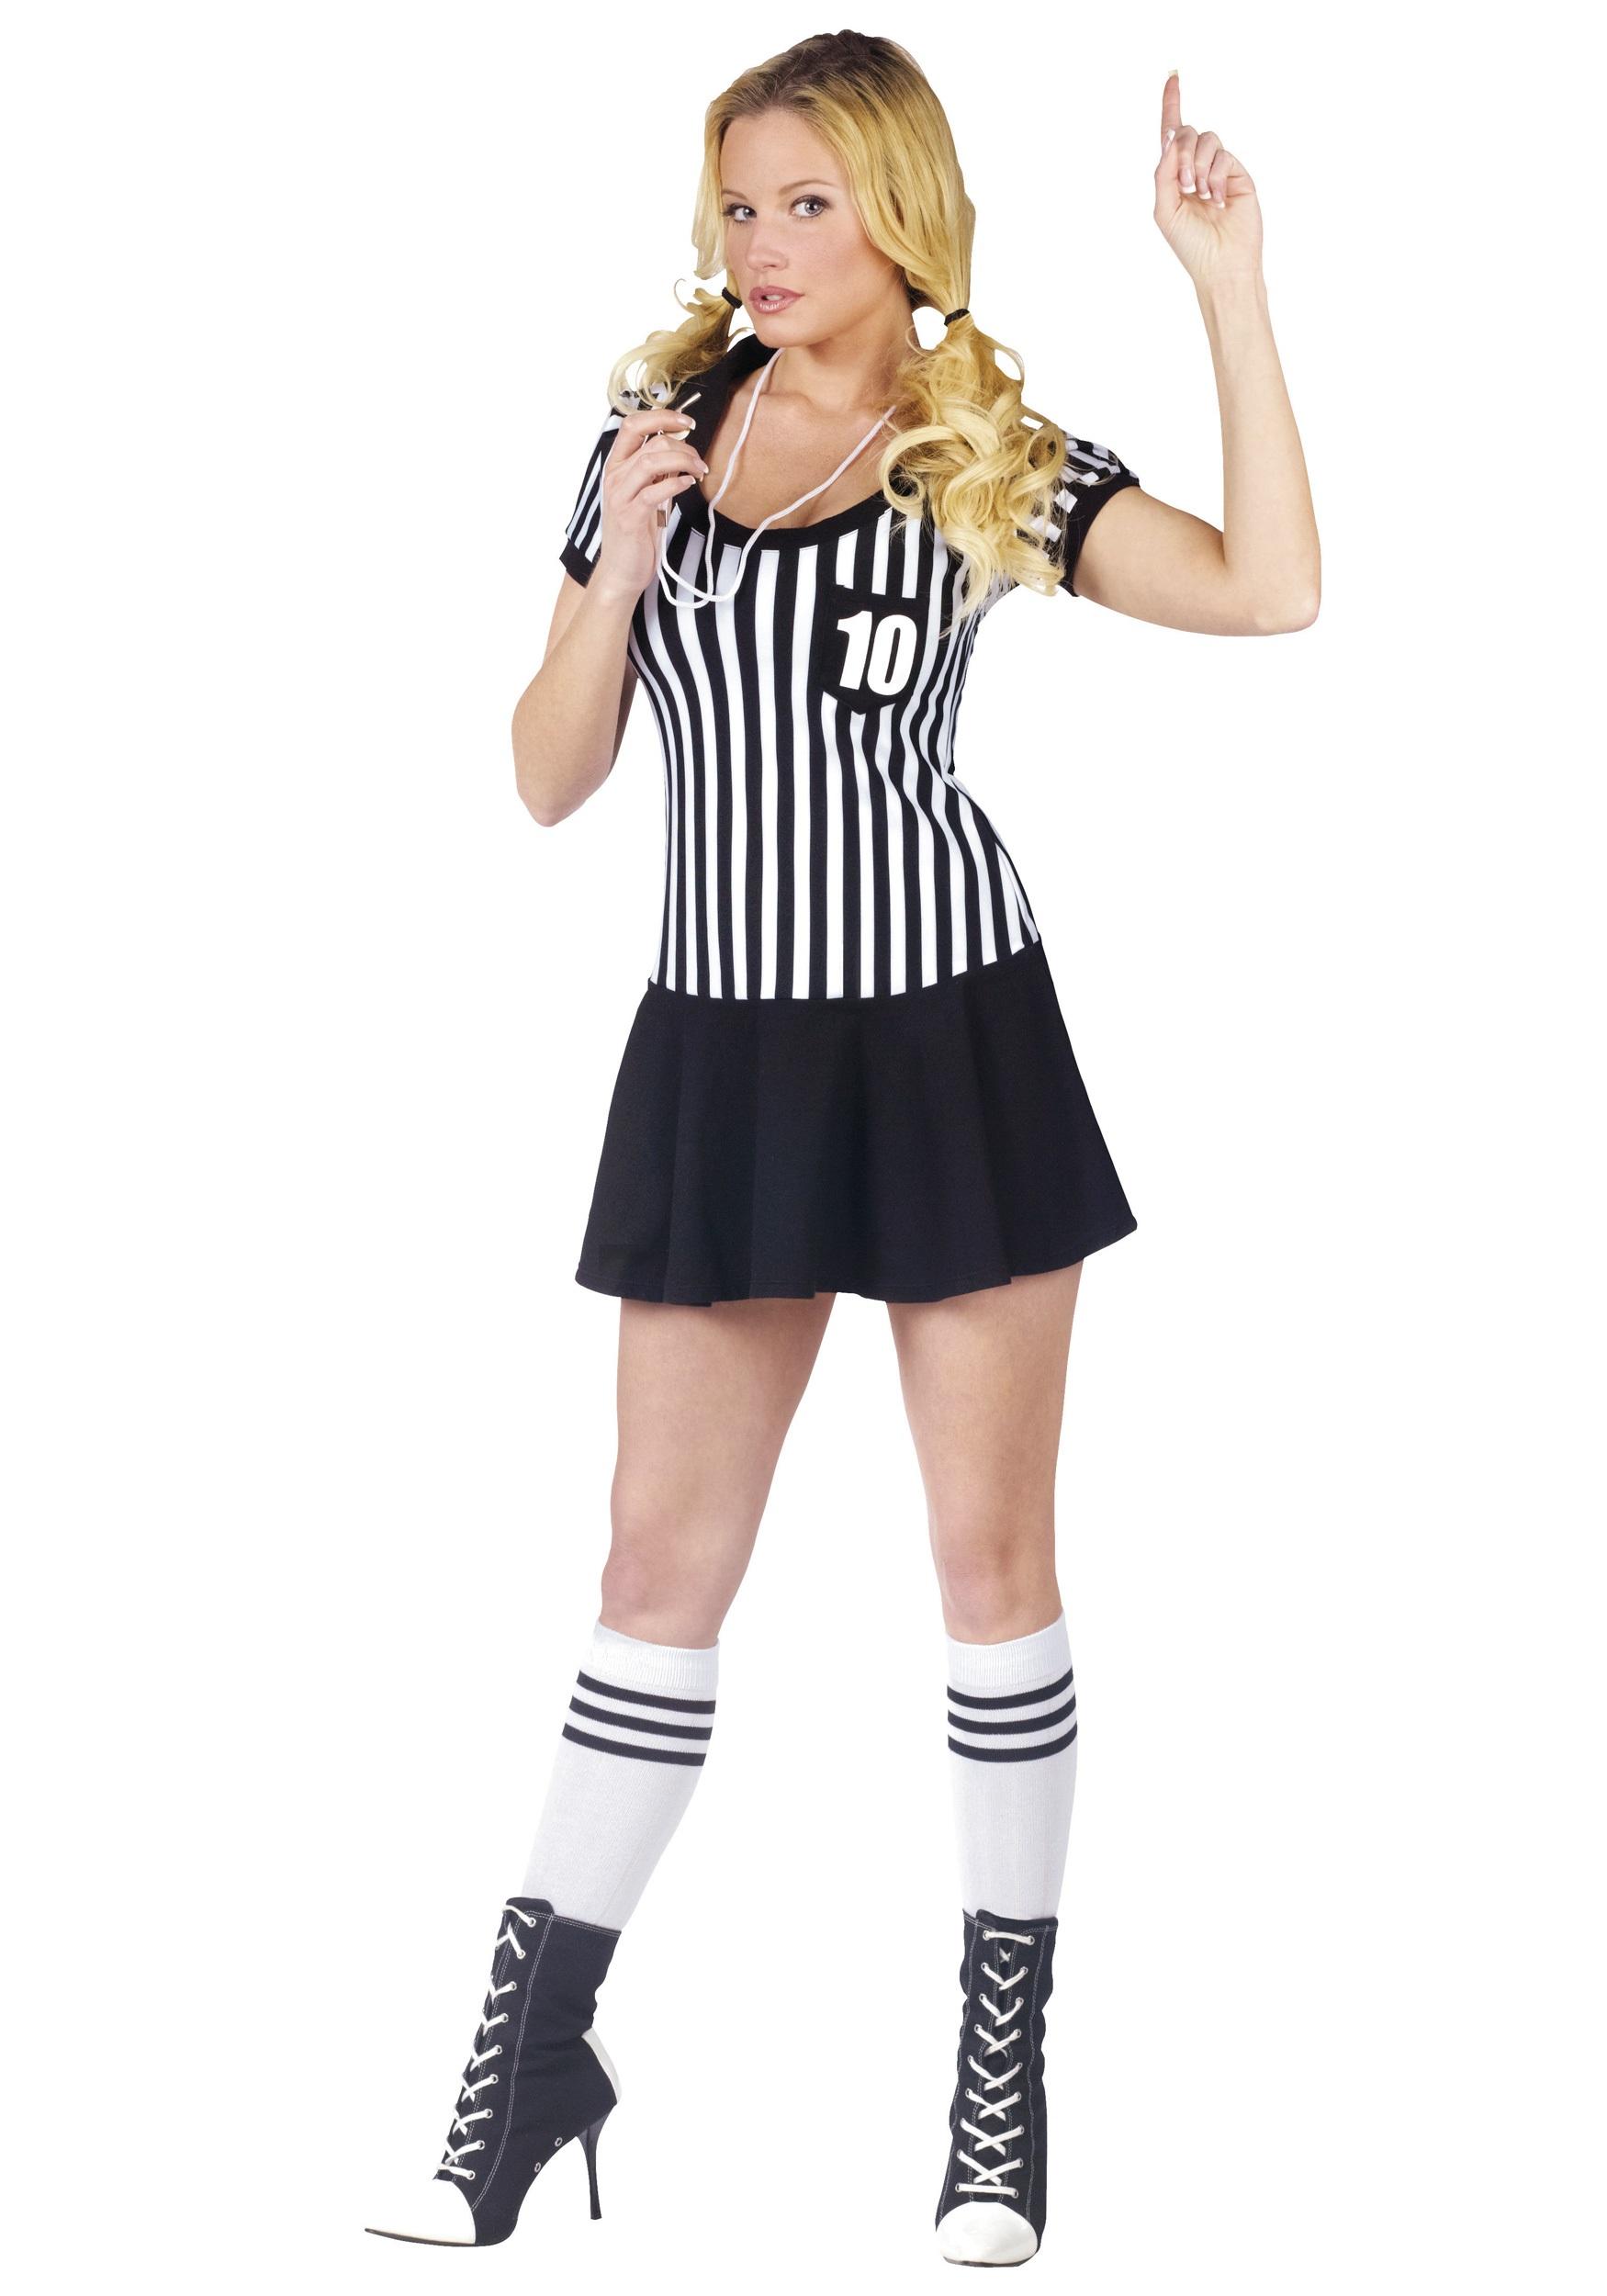 Sexy referee costumes